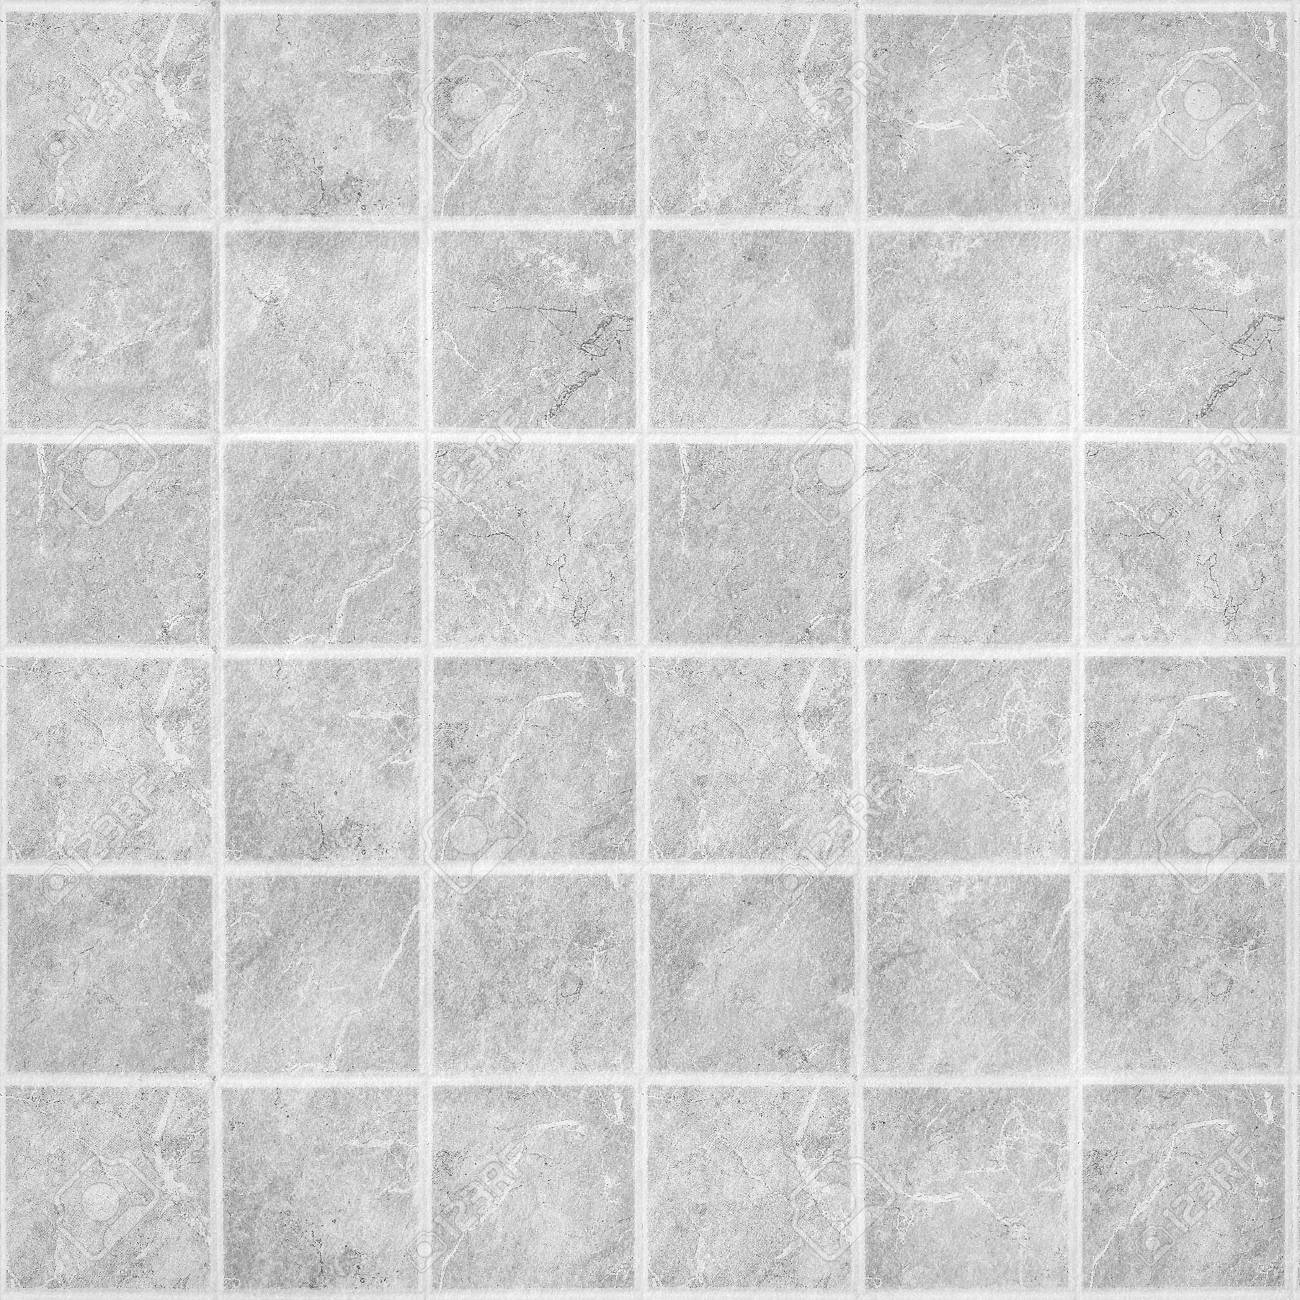 gray ceramic floor tile surface texture backgruond